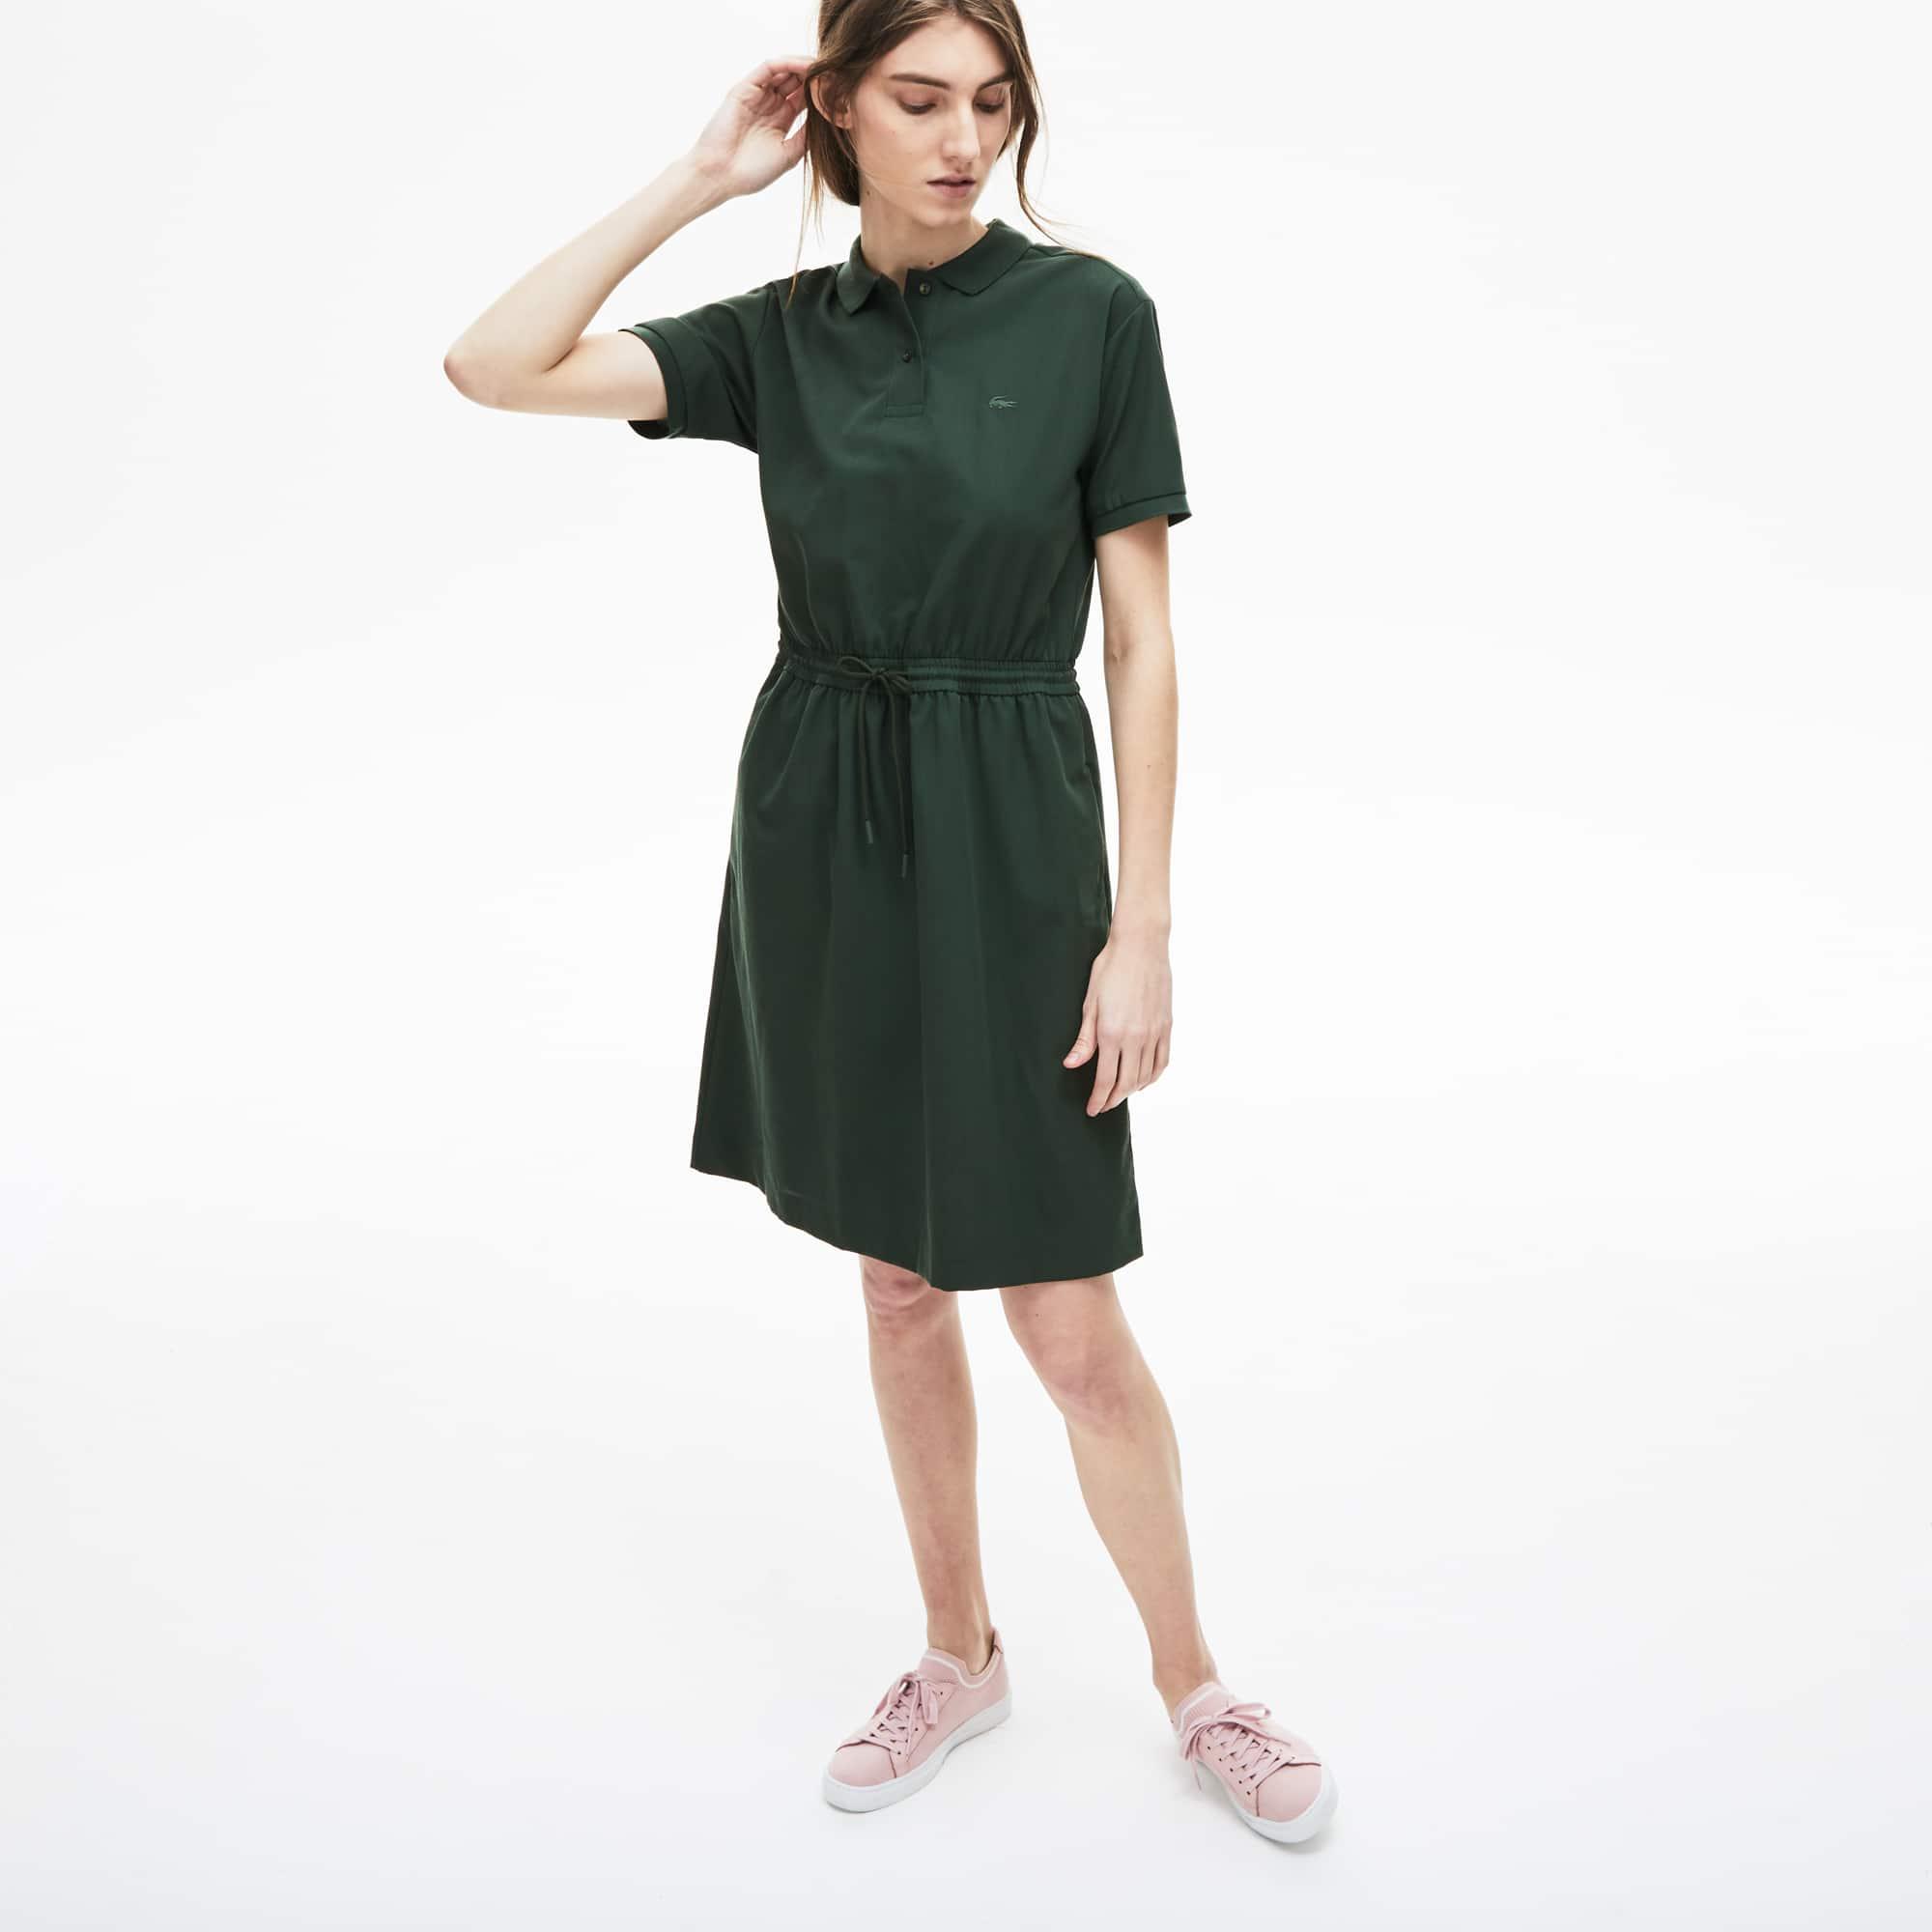 6dceaccf4 Dresses   Skirts